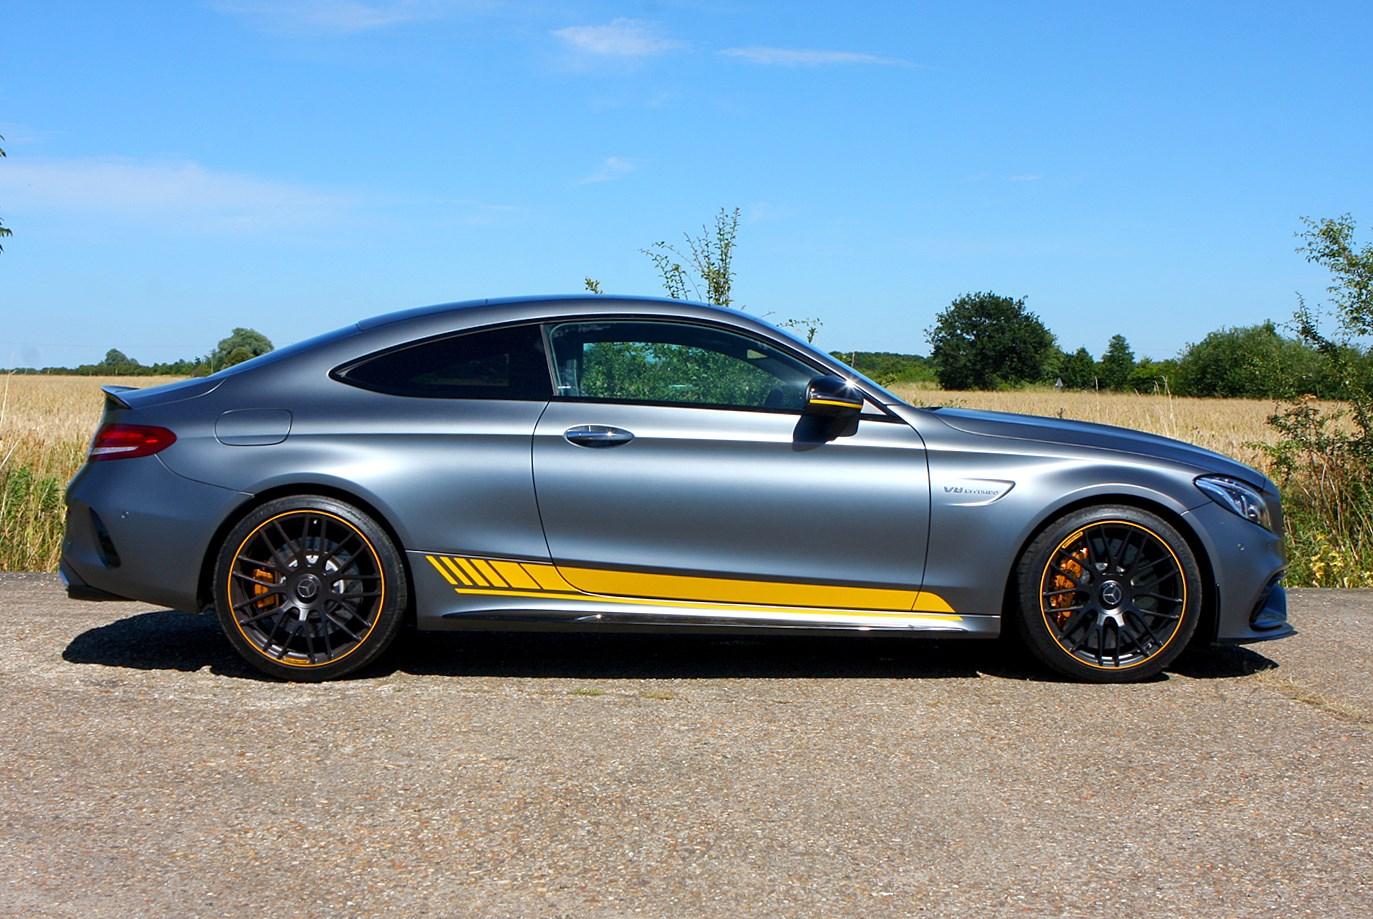 Mercedes benz c class amg 2015 running costs parkers for How much is a mercedes benz c class